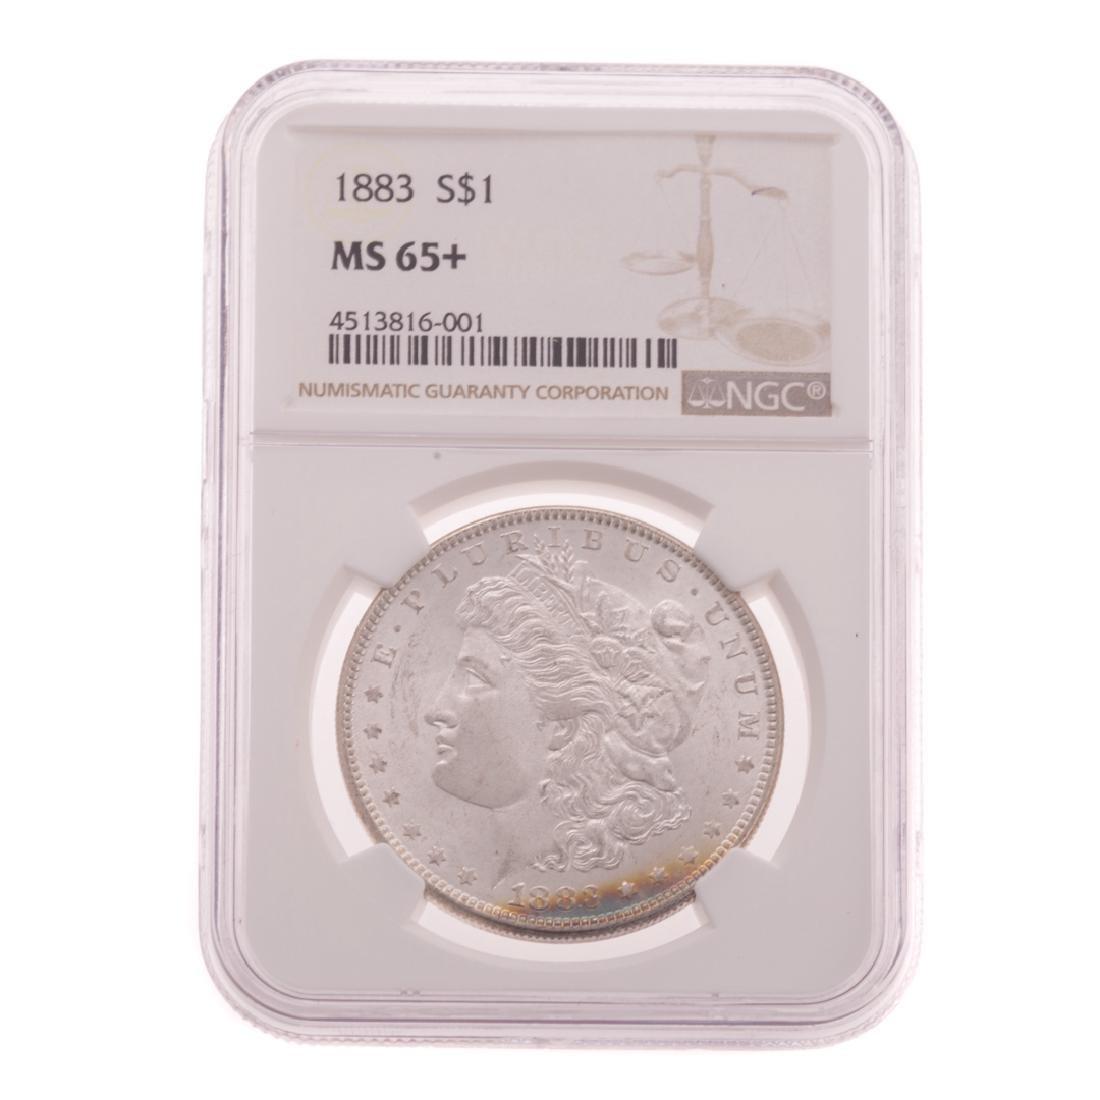 [US] 1883 NGC MS65+ Morgan Dollar